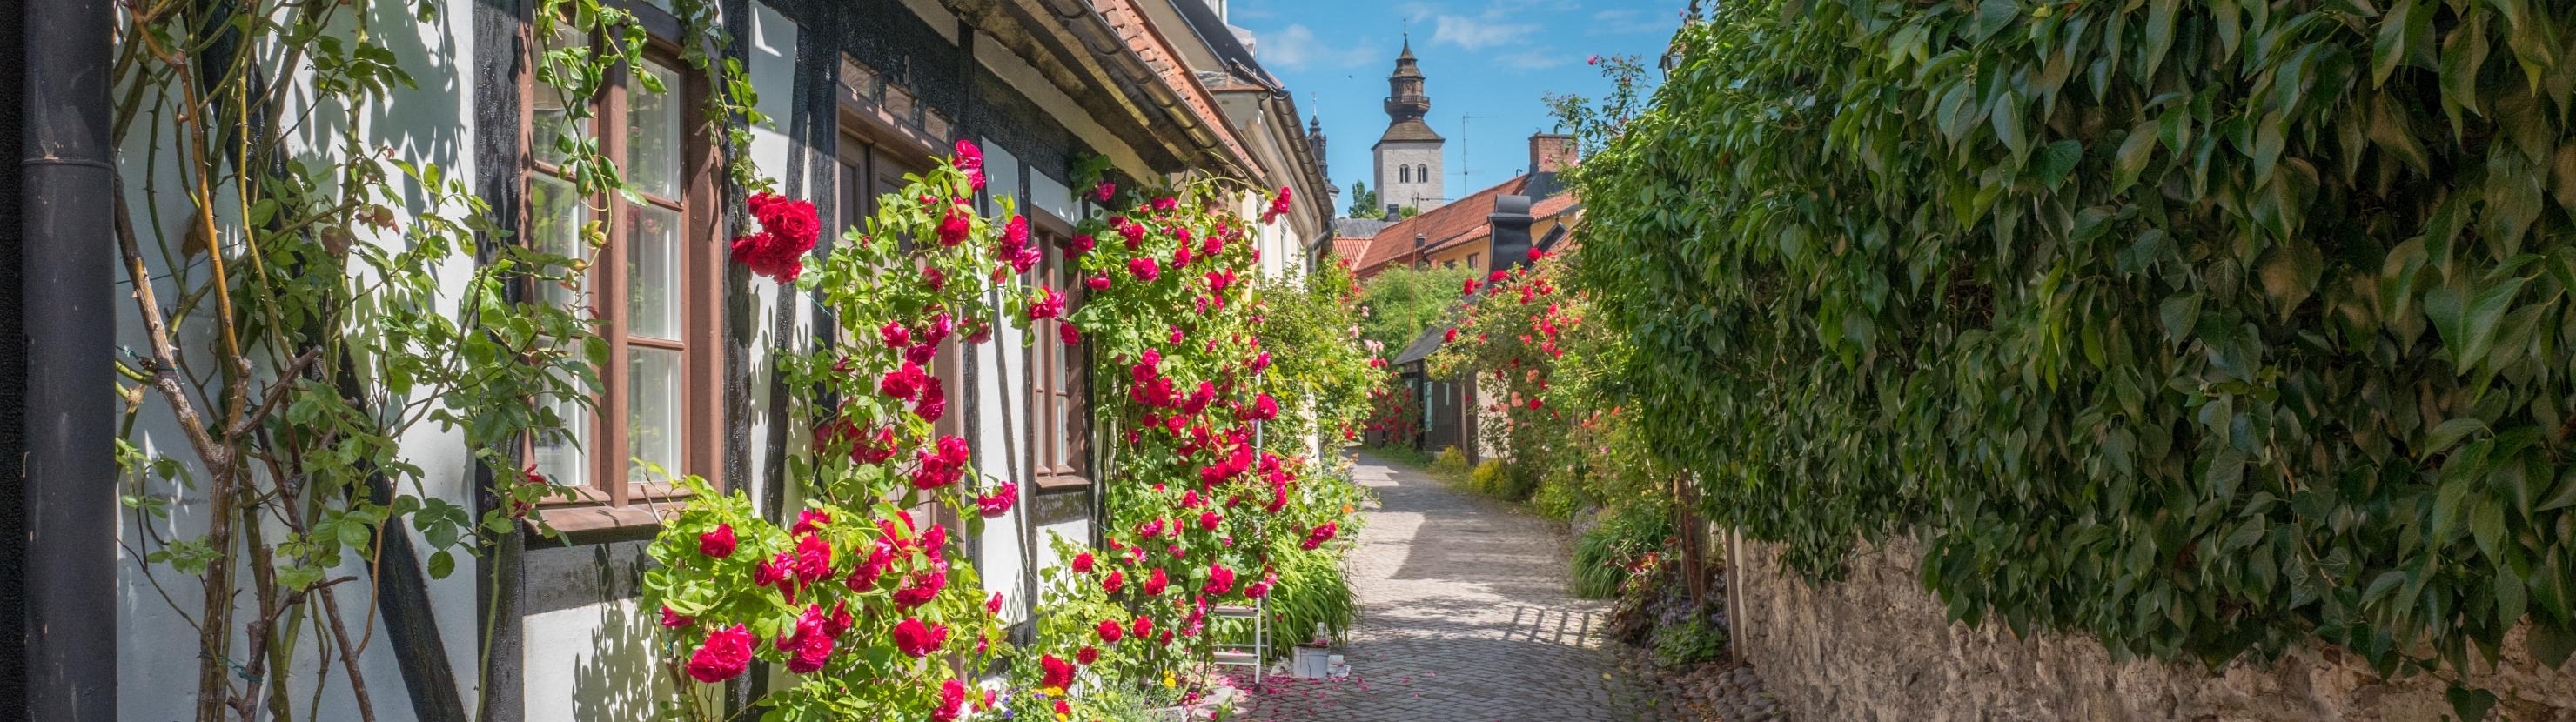 Gotlandi saar